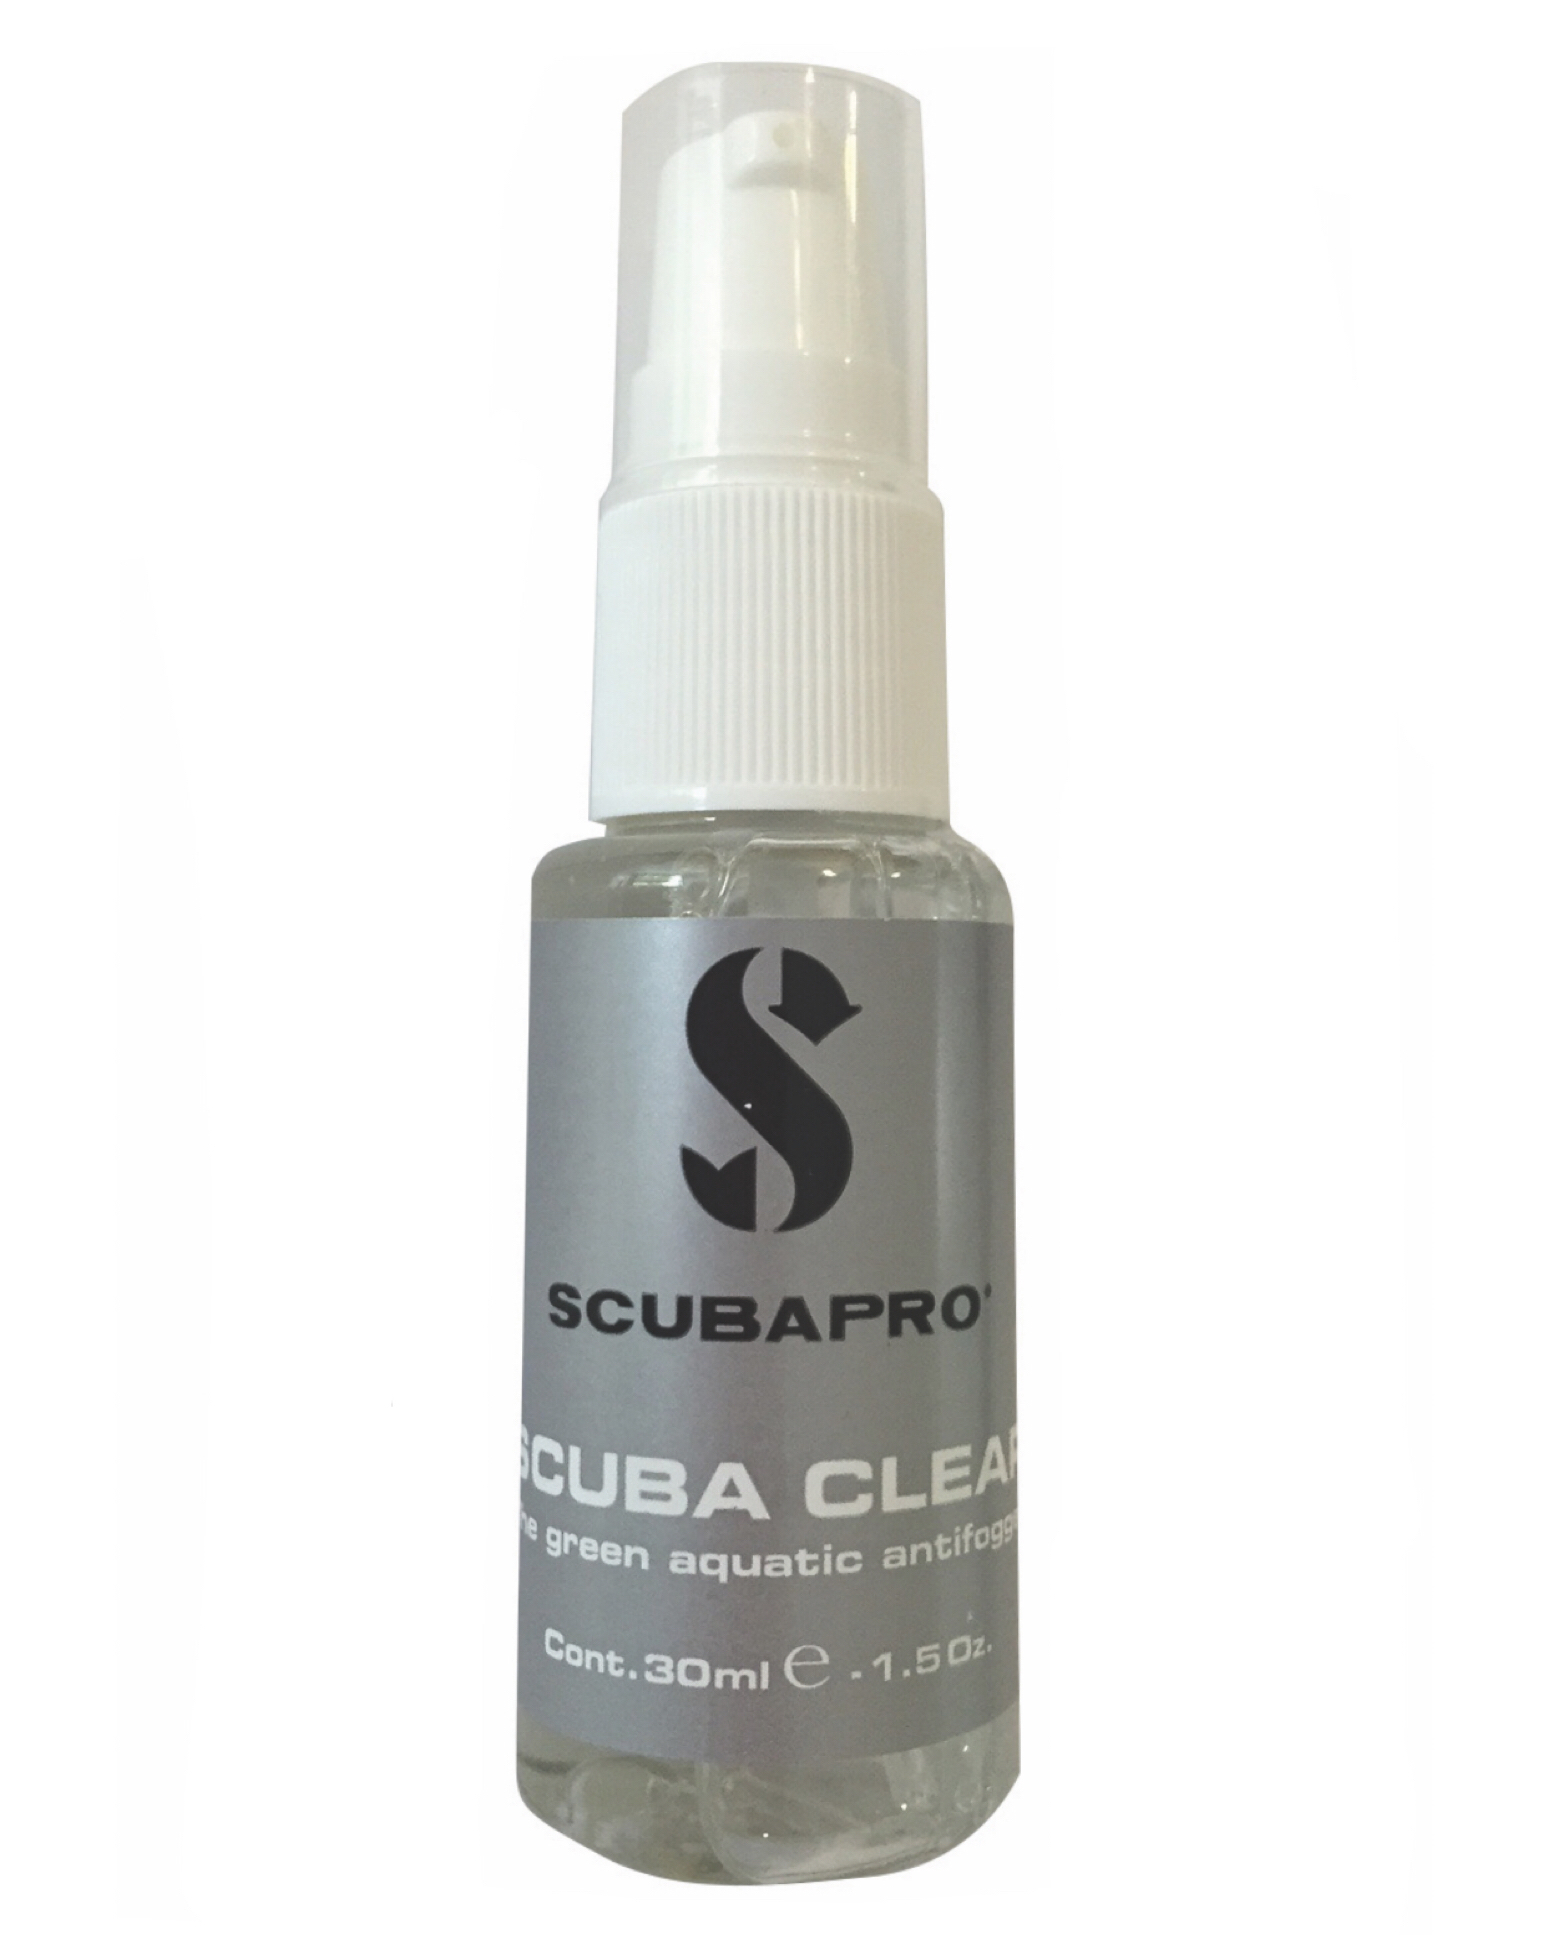 Scubaclear61